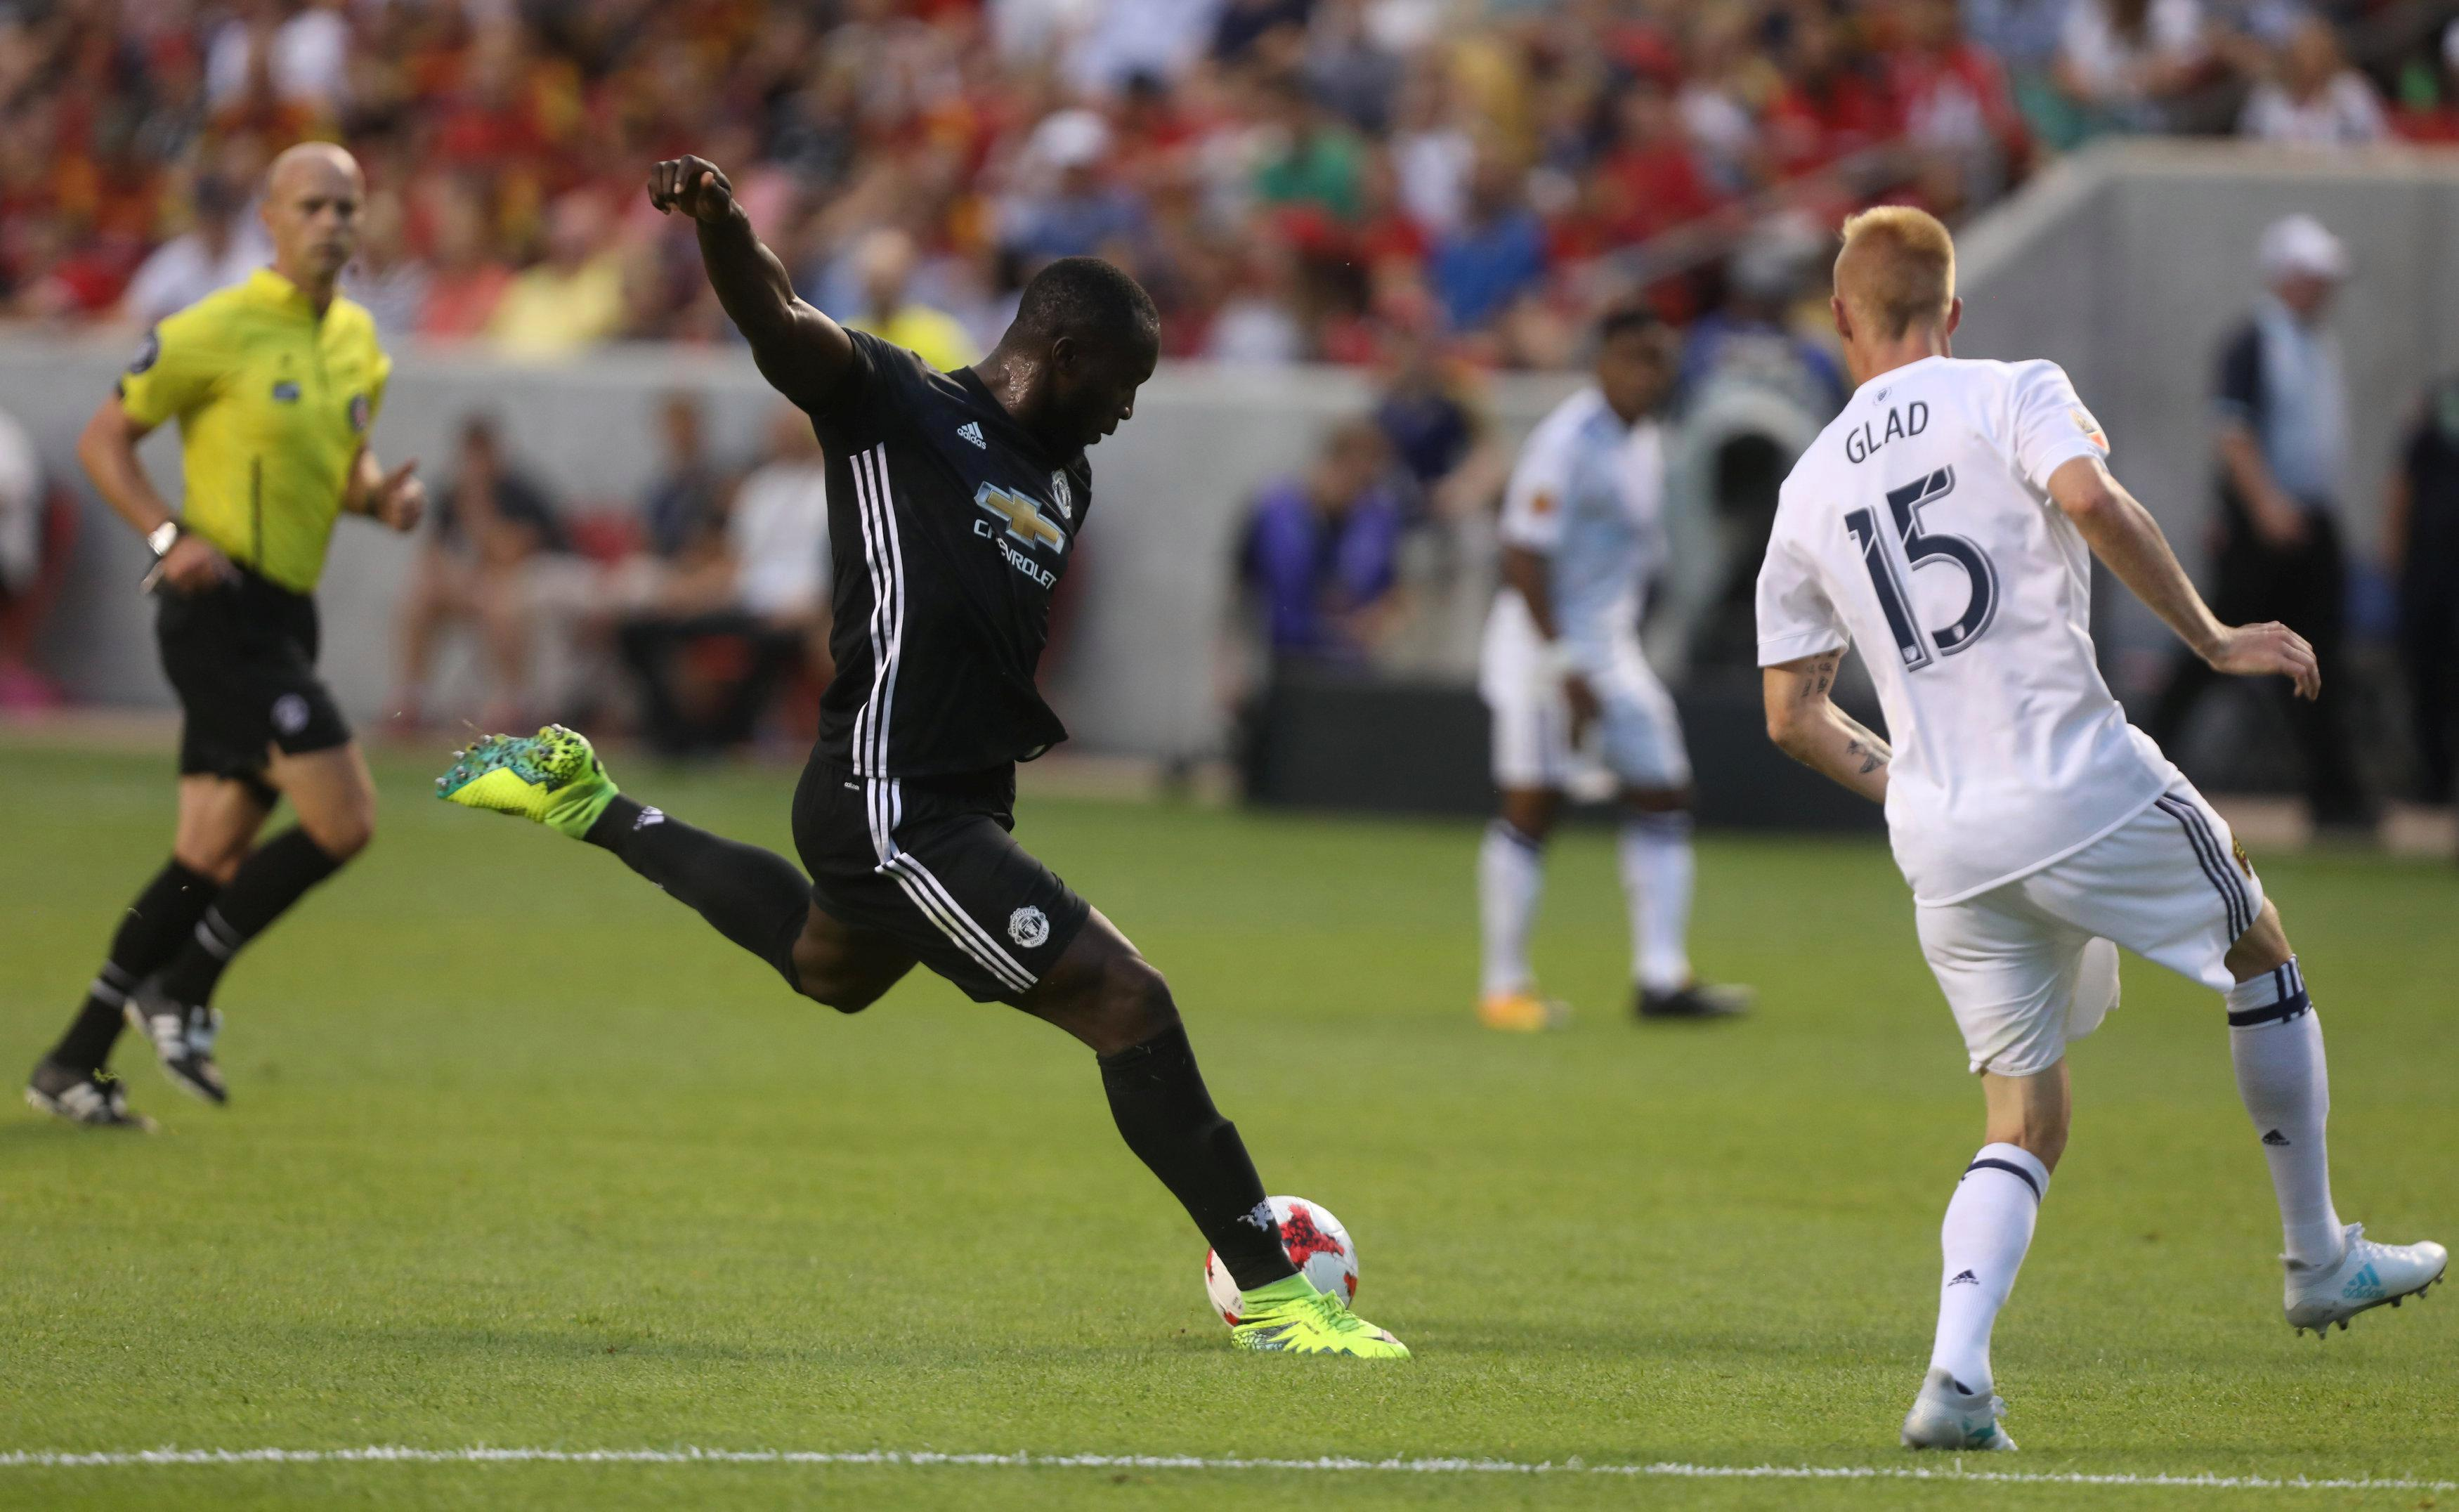 Romelu Lukaku scored his first United goal in the friendly victory over Real Salt Lake